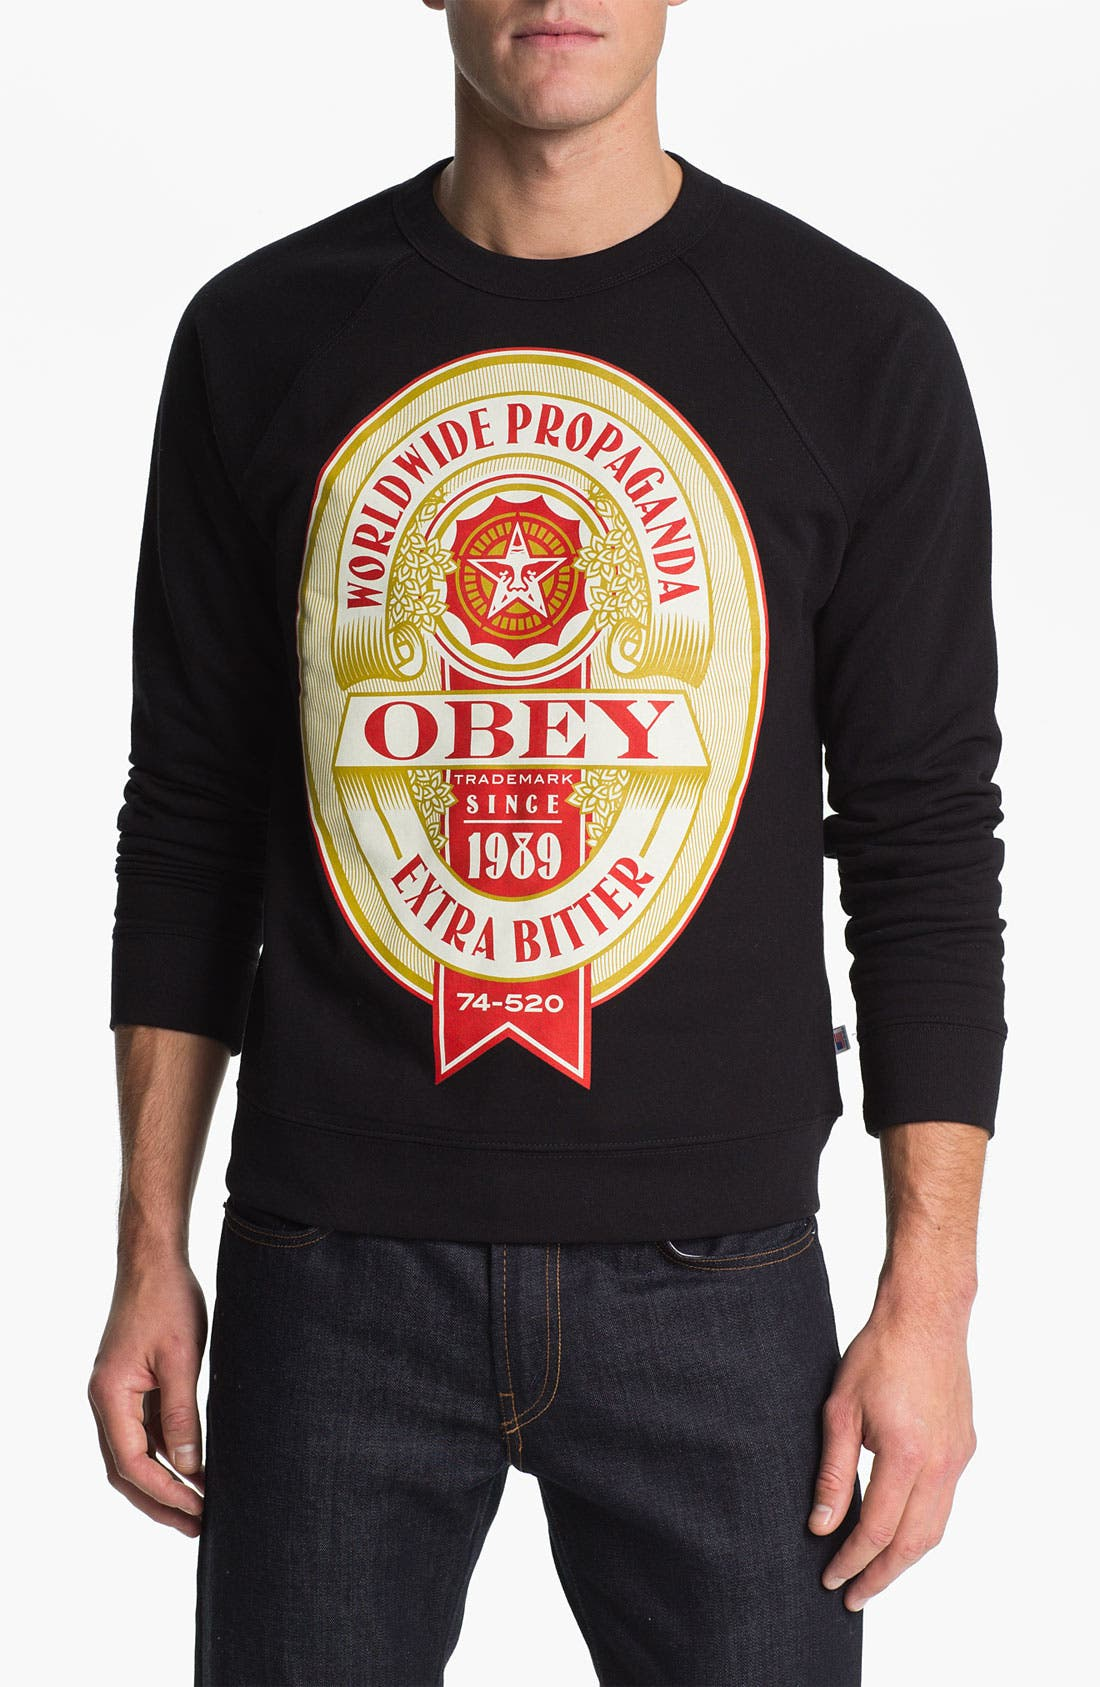 Main Image - Obey 'Extra Bitter' Crewneck Fleece Sweatshirt